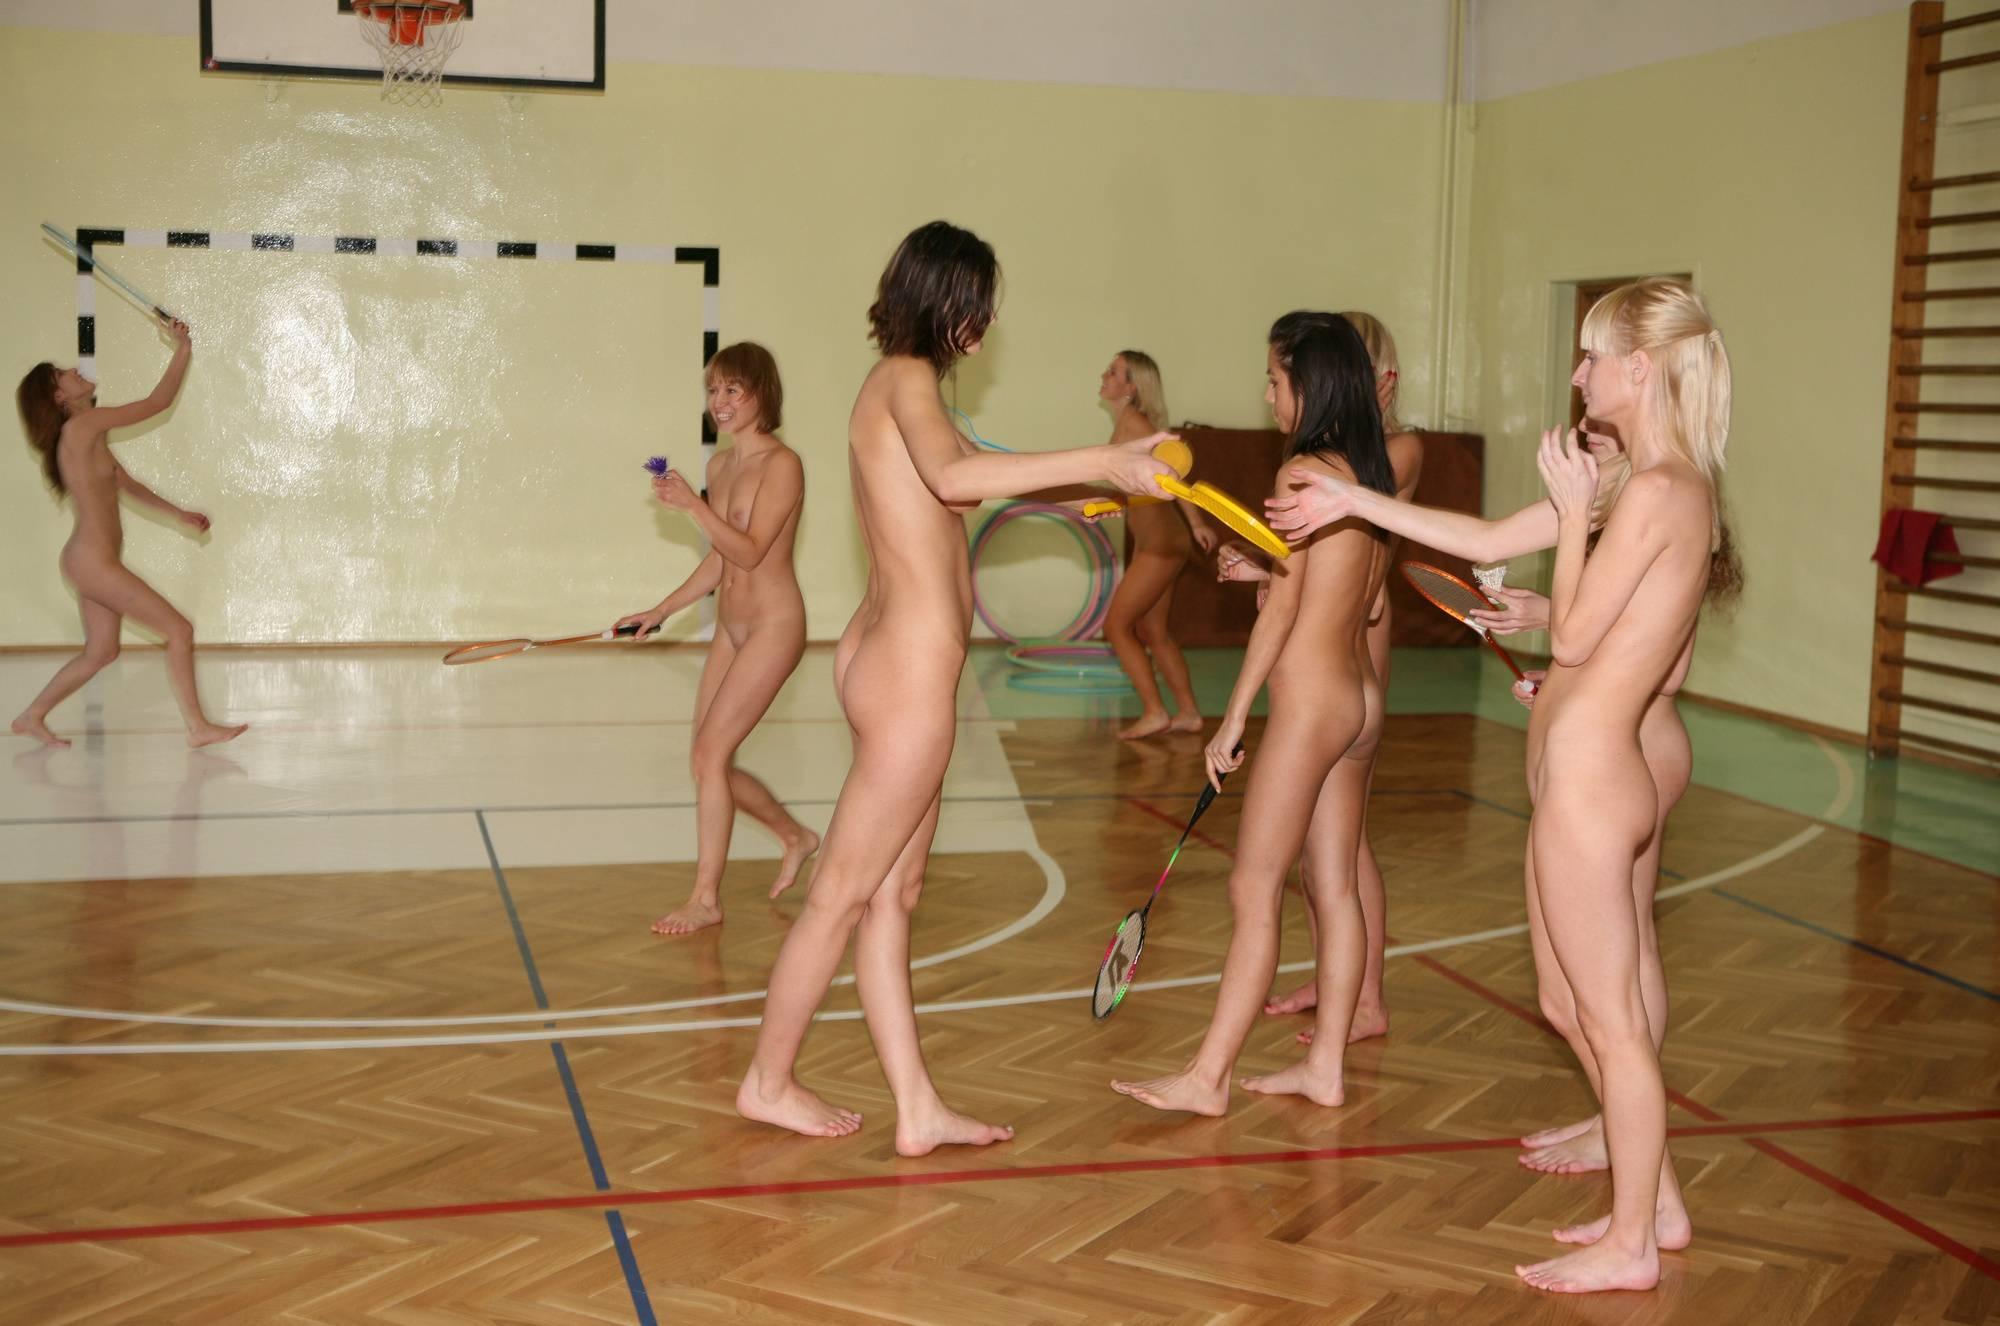 Nudist Gallery Gym Babington and Rackets - 2